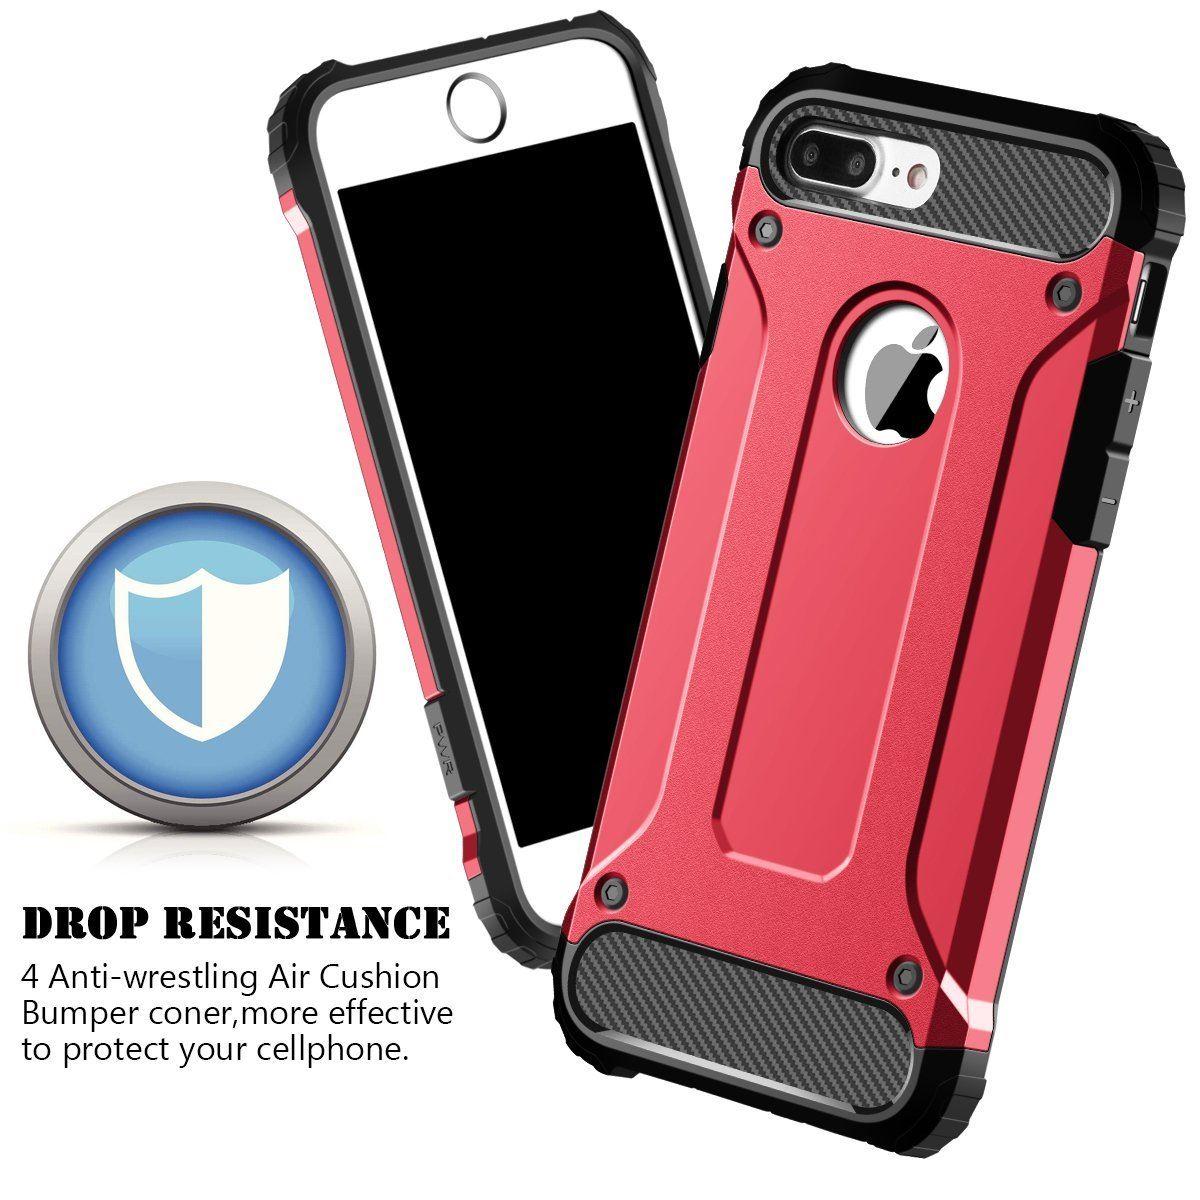 thumbnail 60 - For Apple iPhone 11 Pro Max XR Xs X 8 7 Plus 6 5 Se Case Cover Impact Heavy Duty